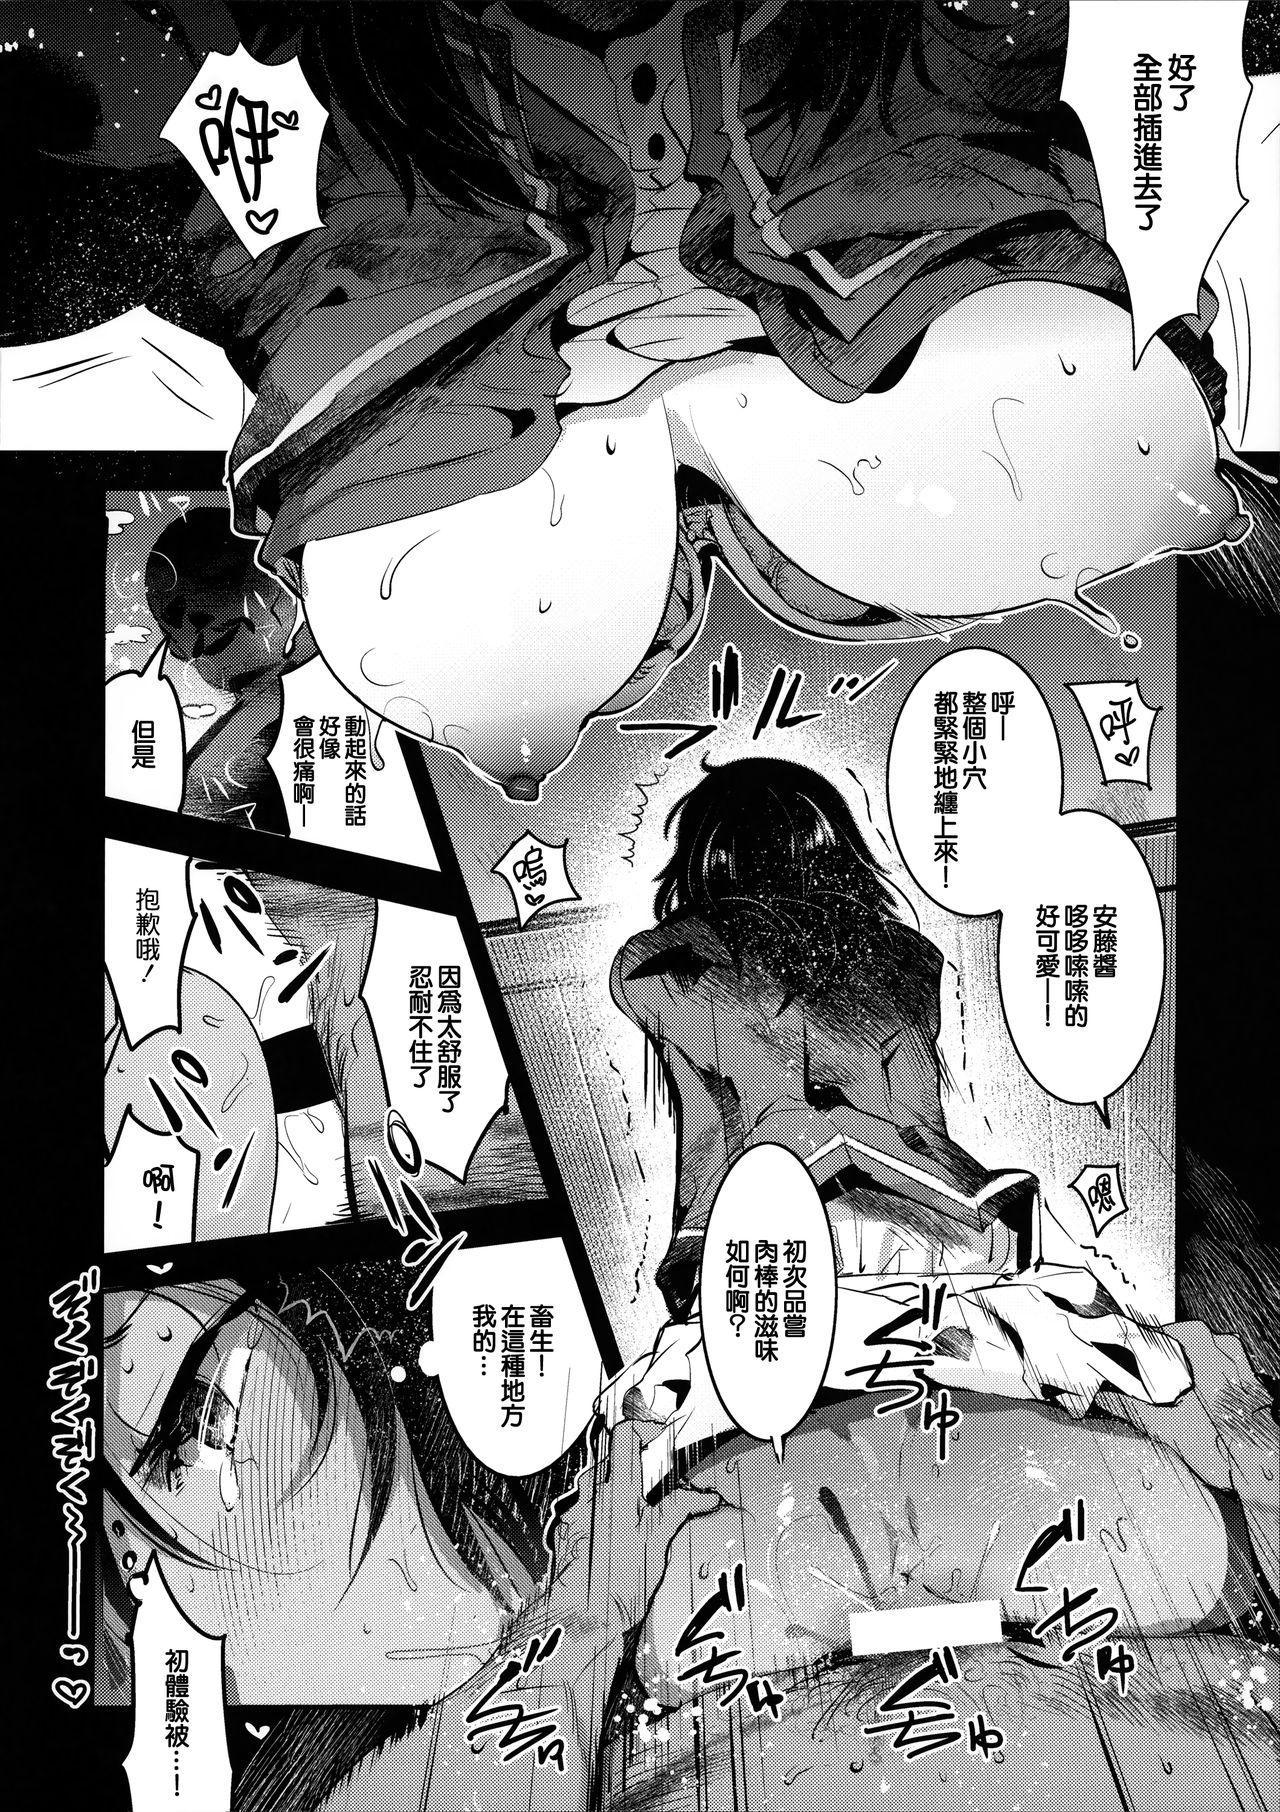 GirlPan Rakugakichou 6 11